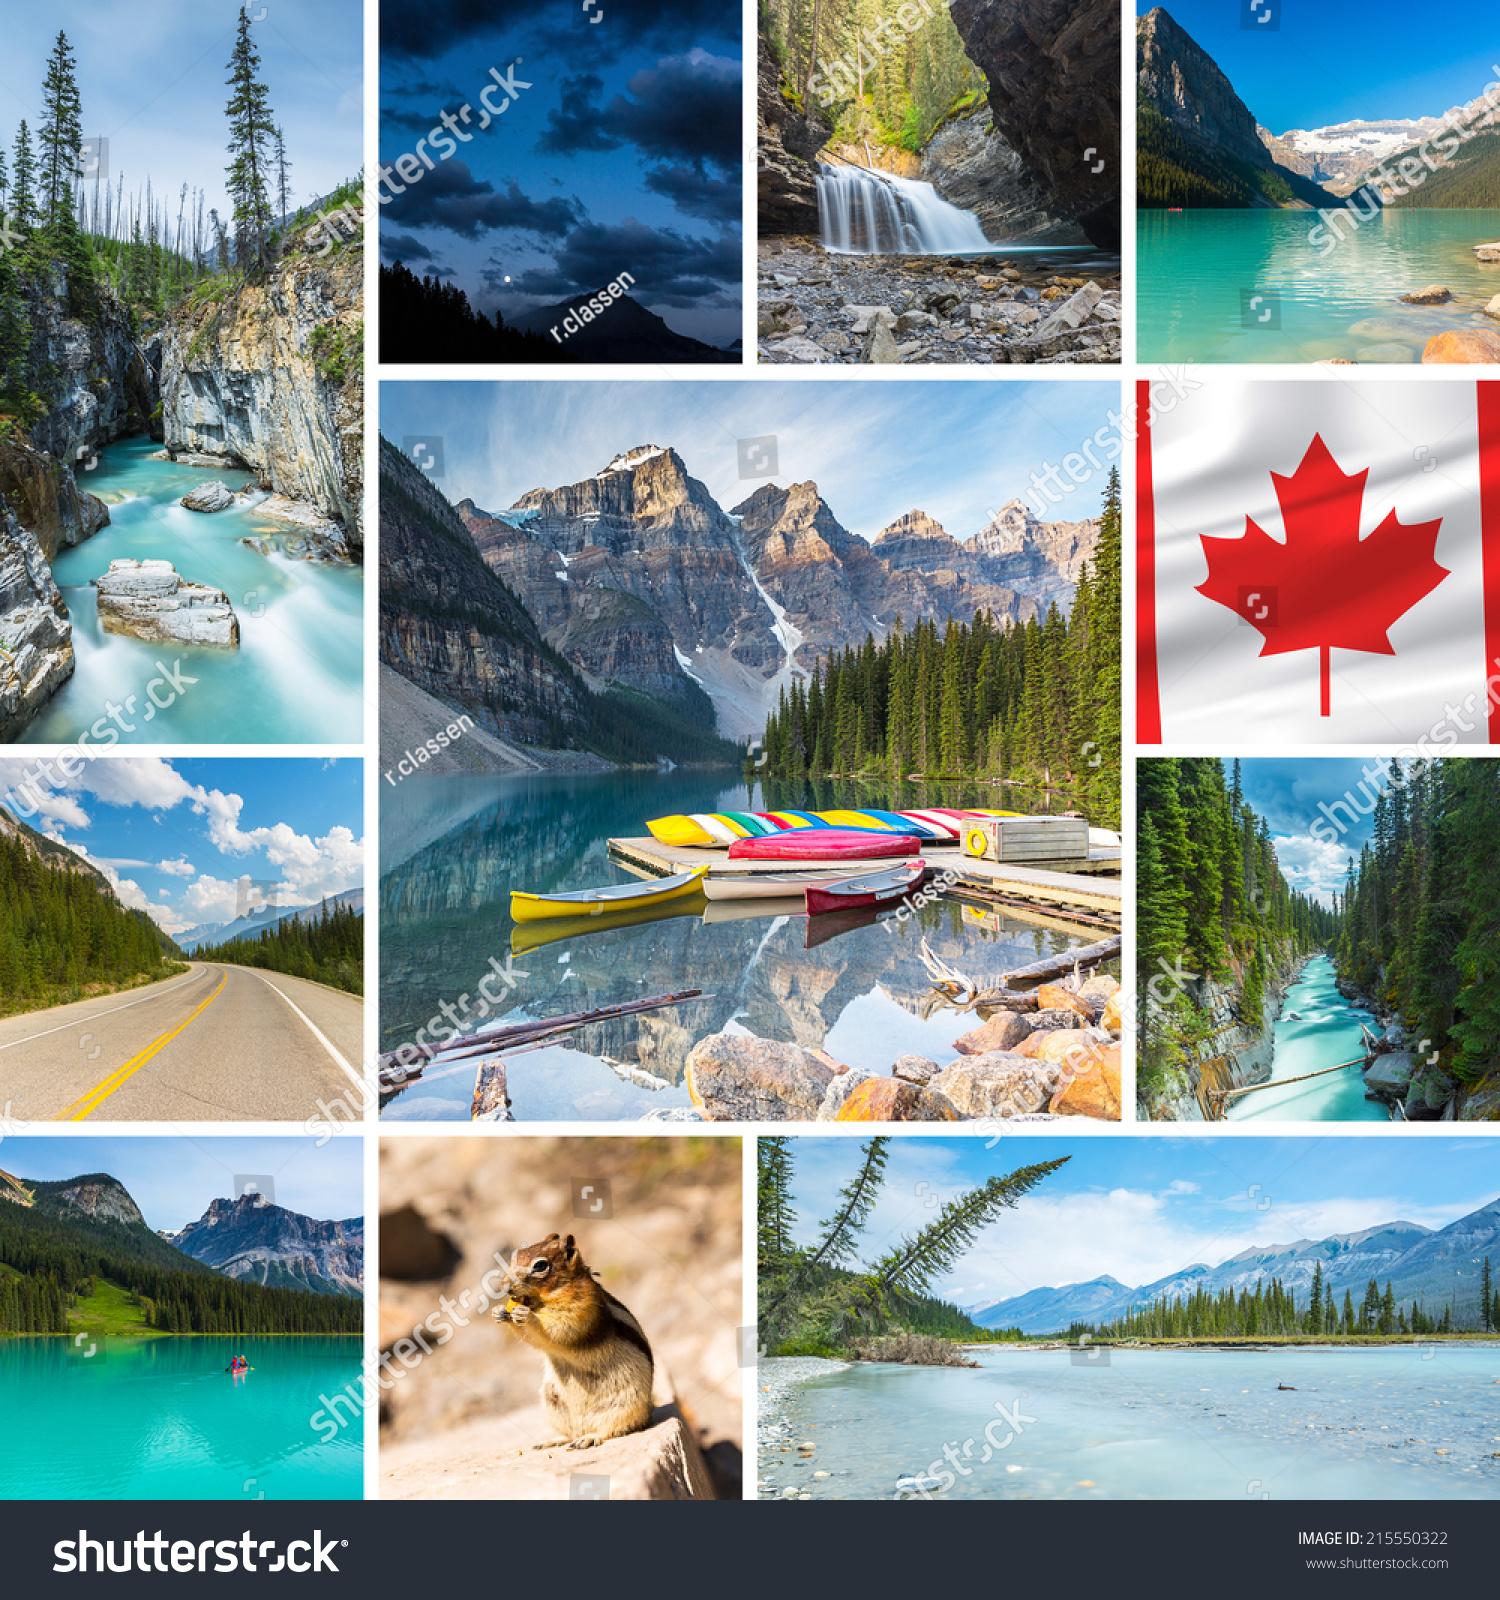 Numa Falls Wallpaper Canada Collage Lake Louise Waterfall Canoe Stock Photo